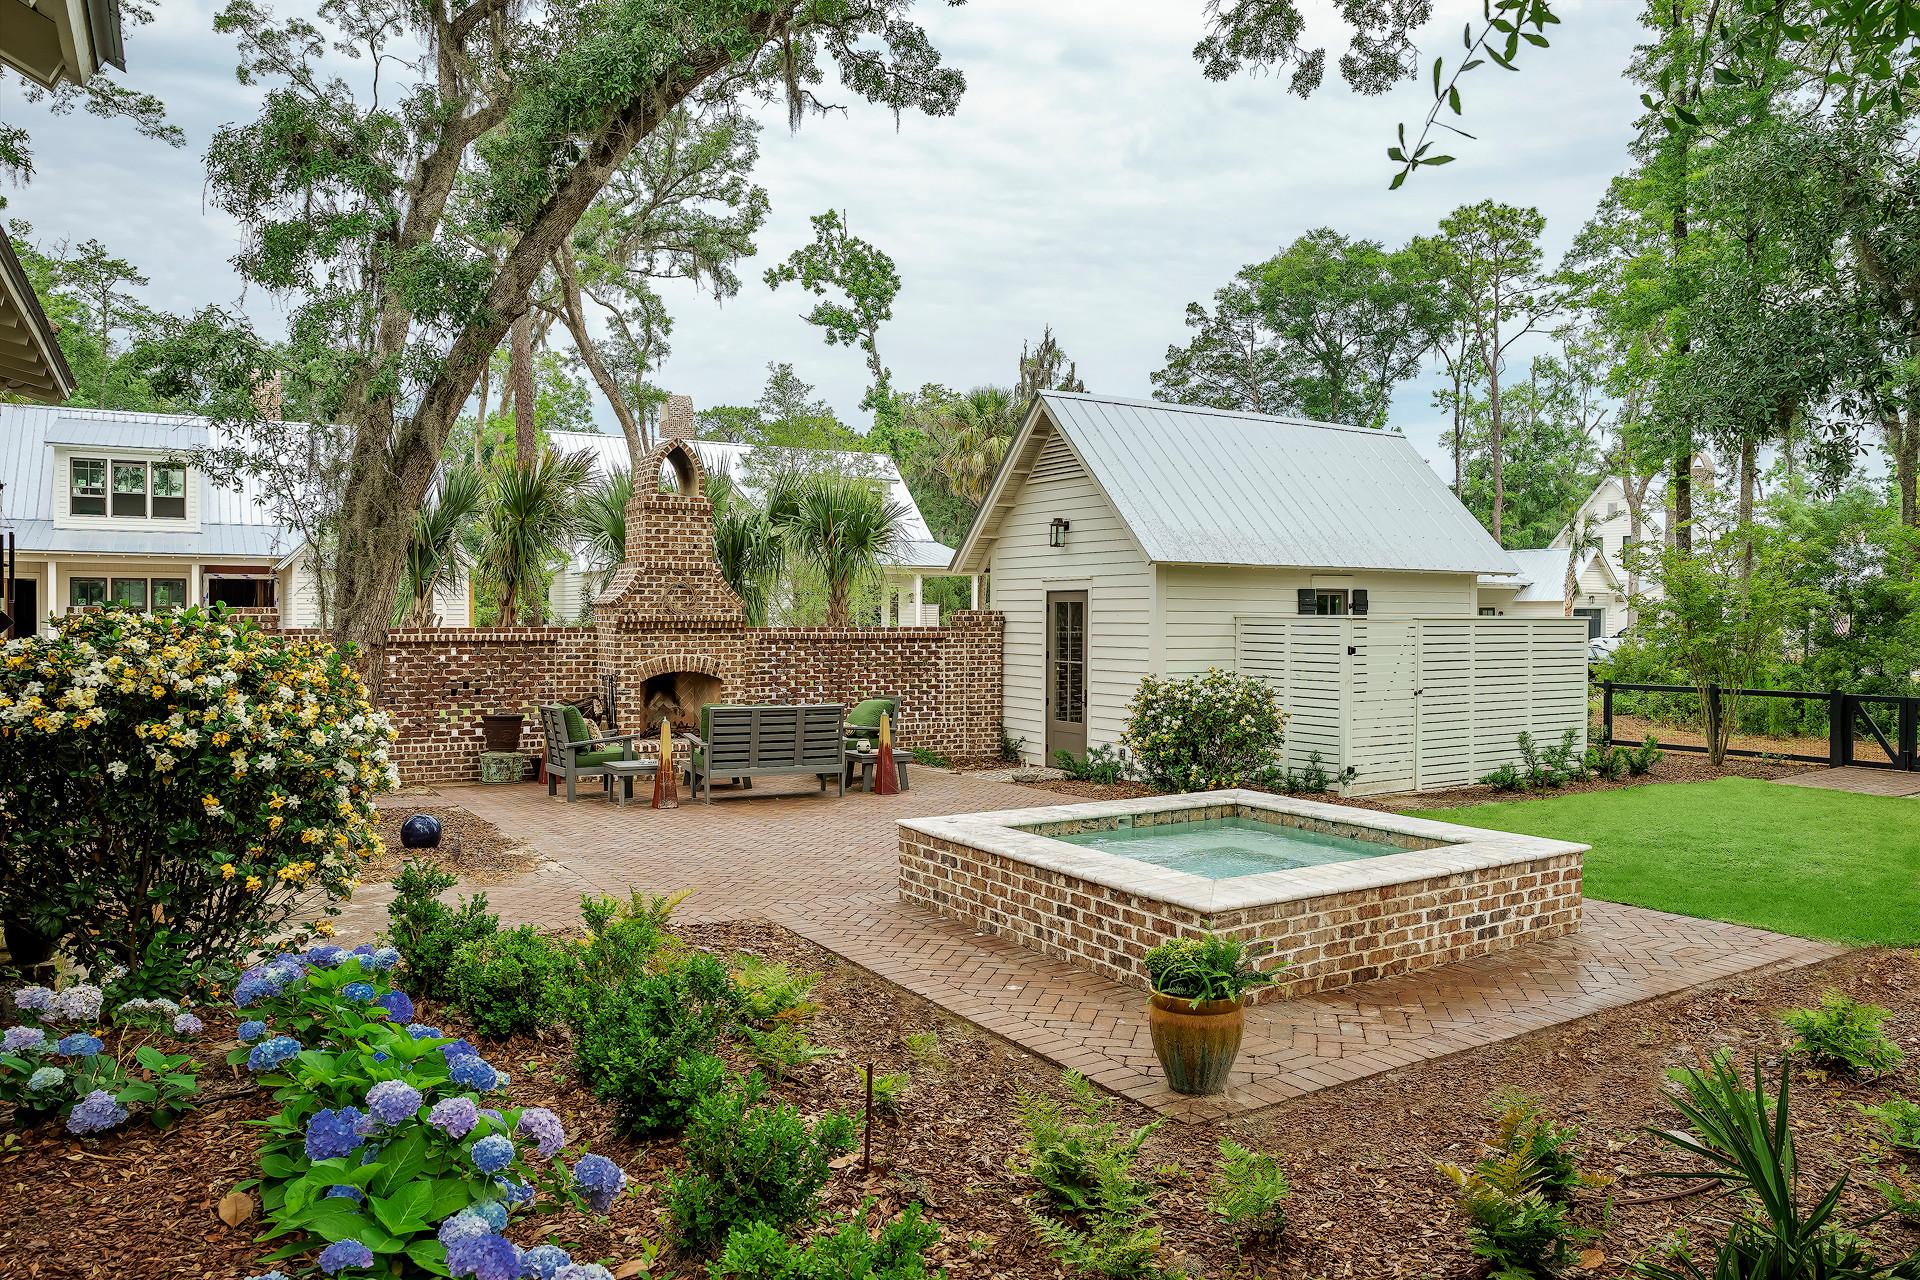 Palmetto Bluff Cottages